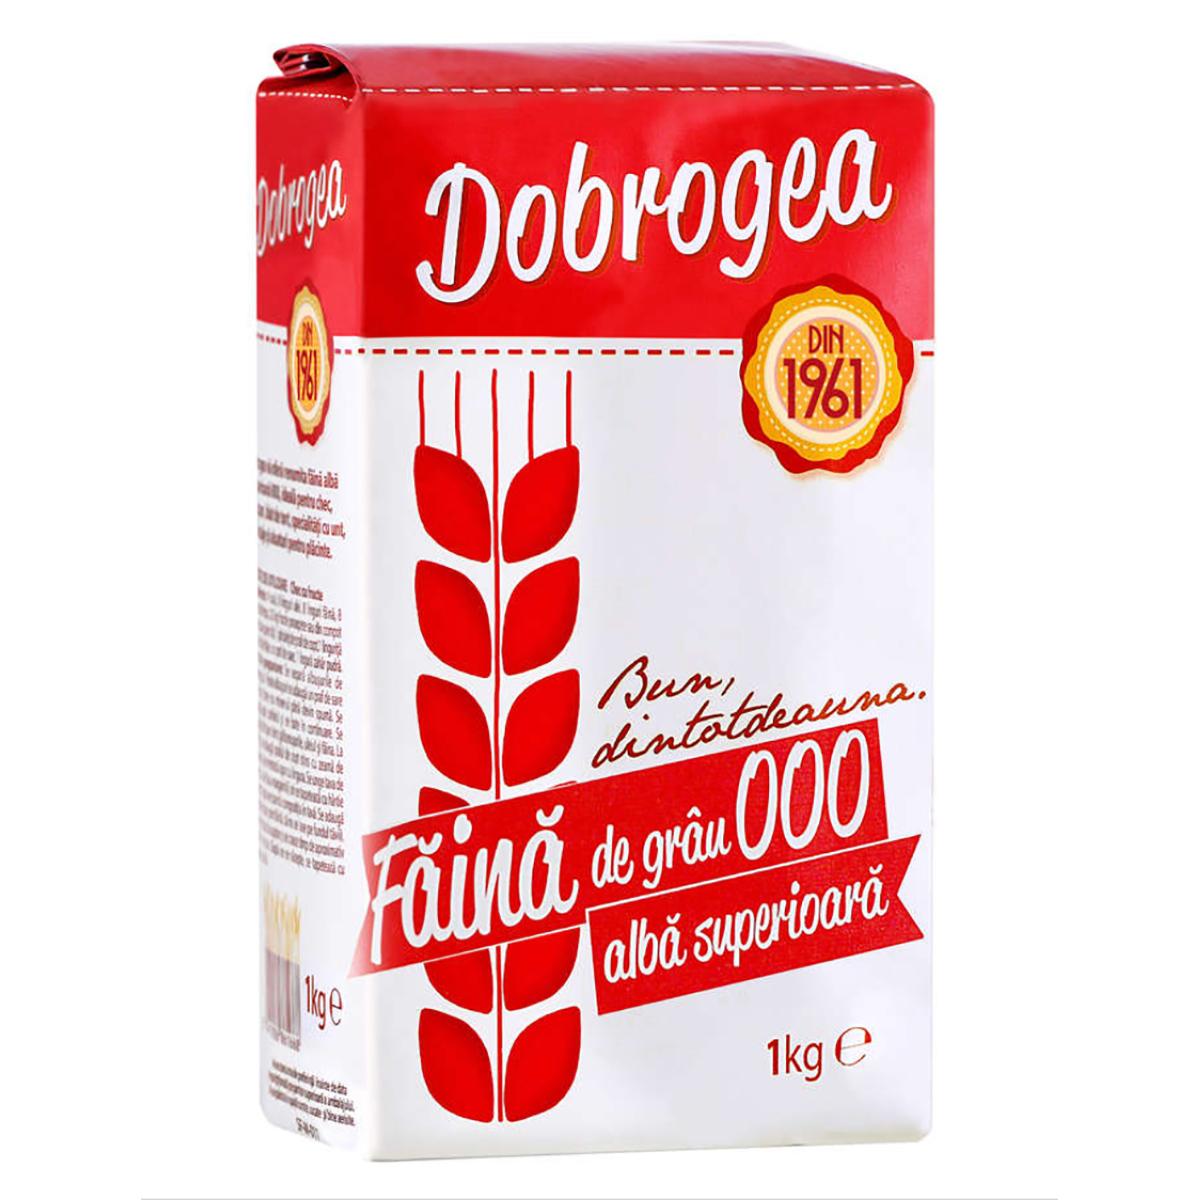 Faina de grau 000 alba superioara Dobrogea, 1 kg imagine